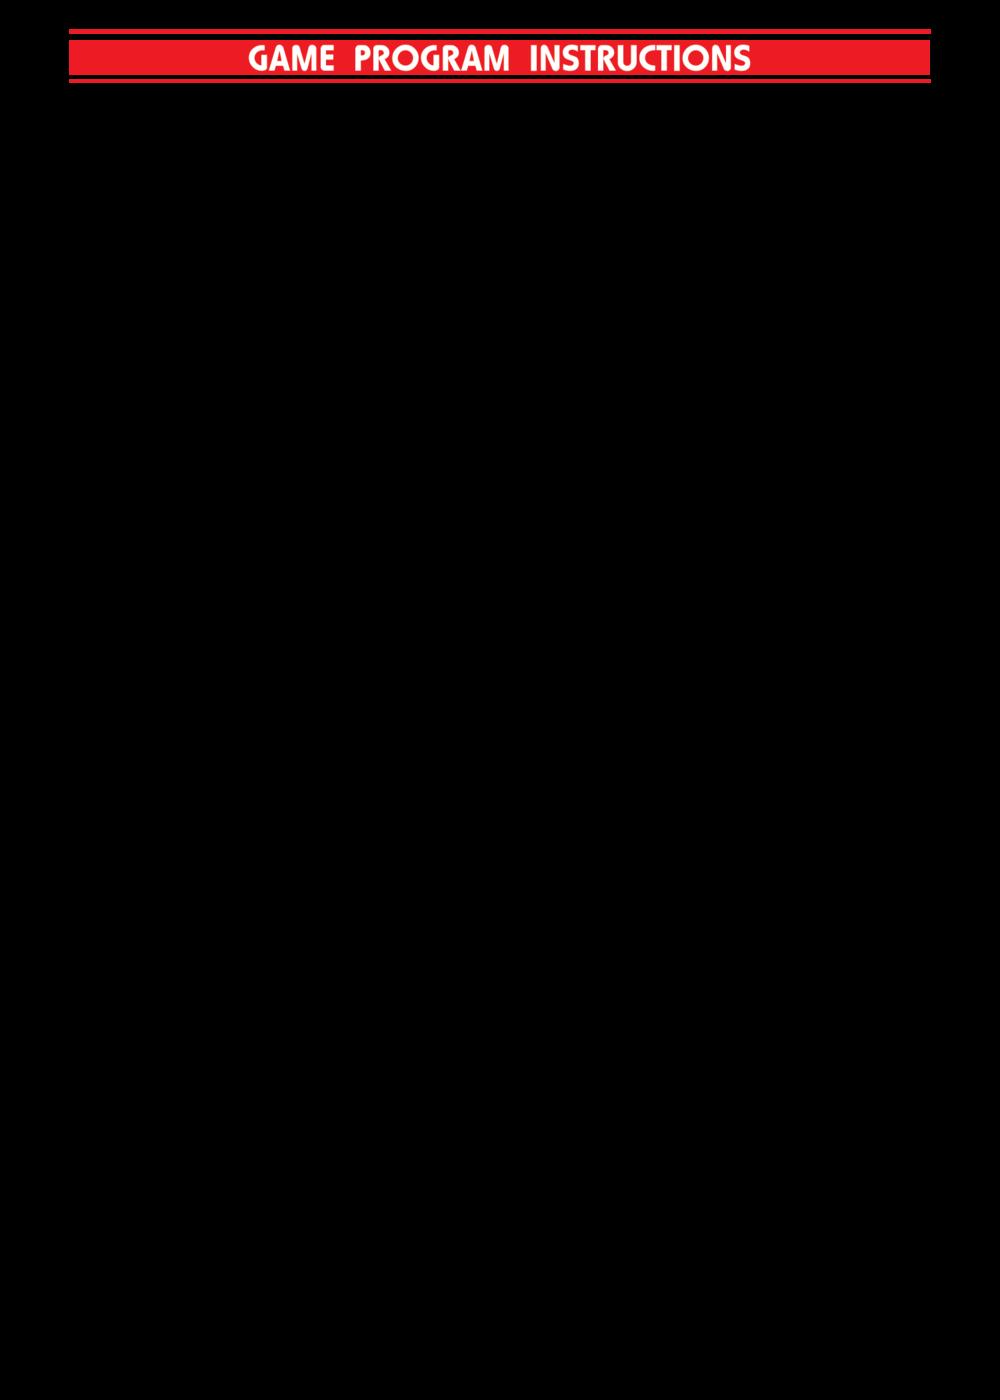 Kyle Fox Duel Manual-06.png